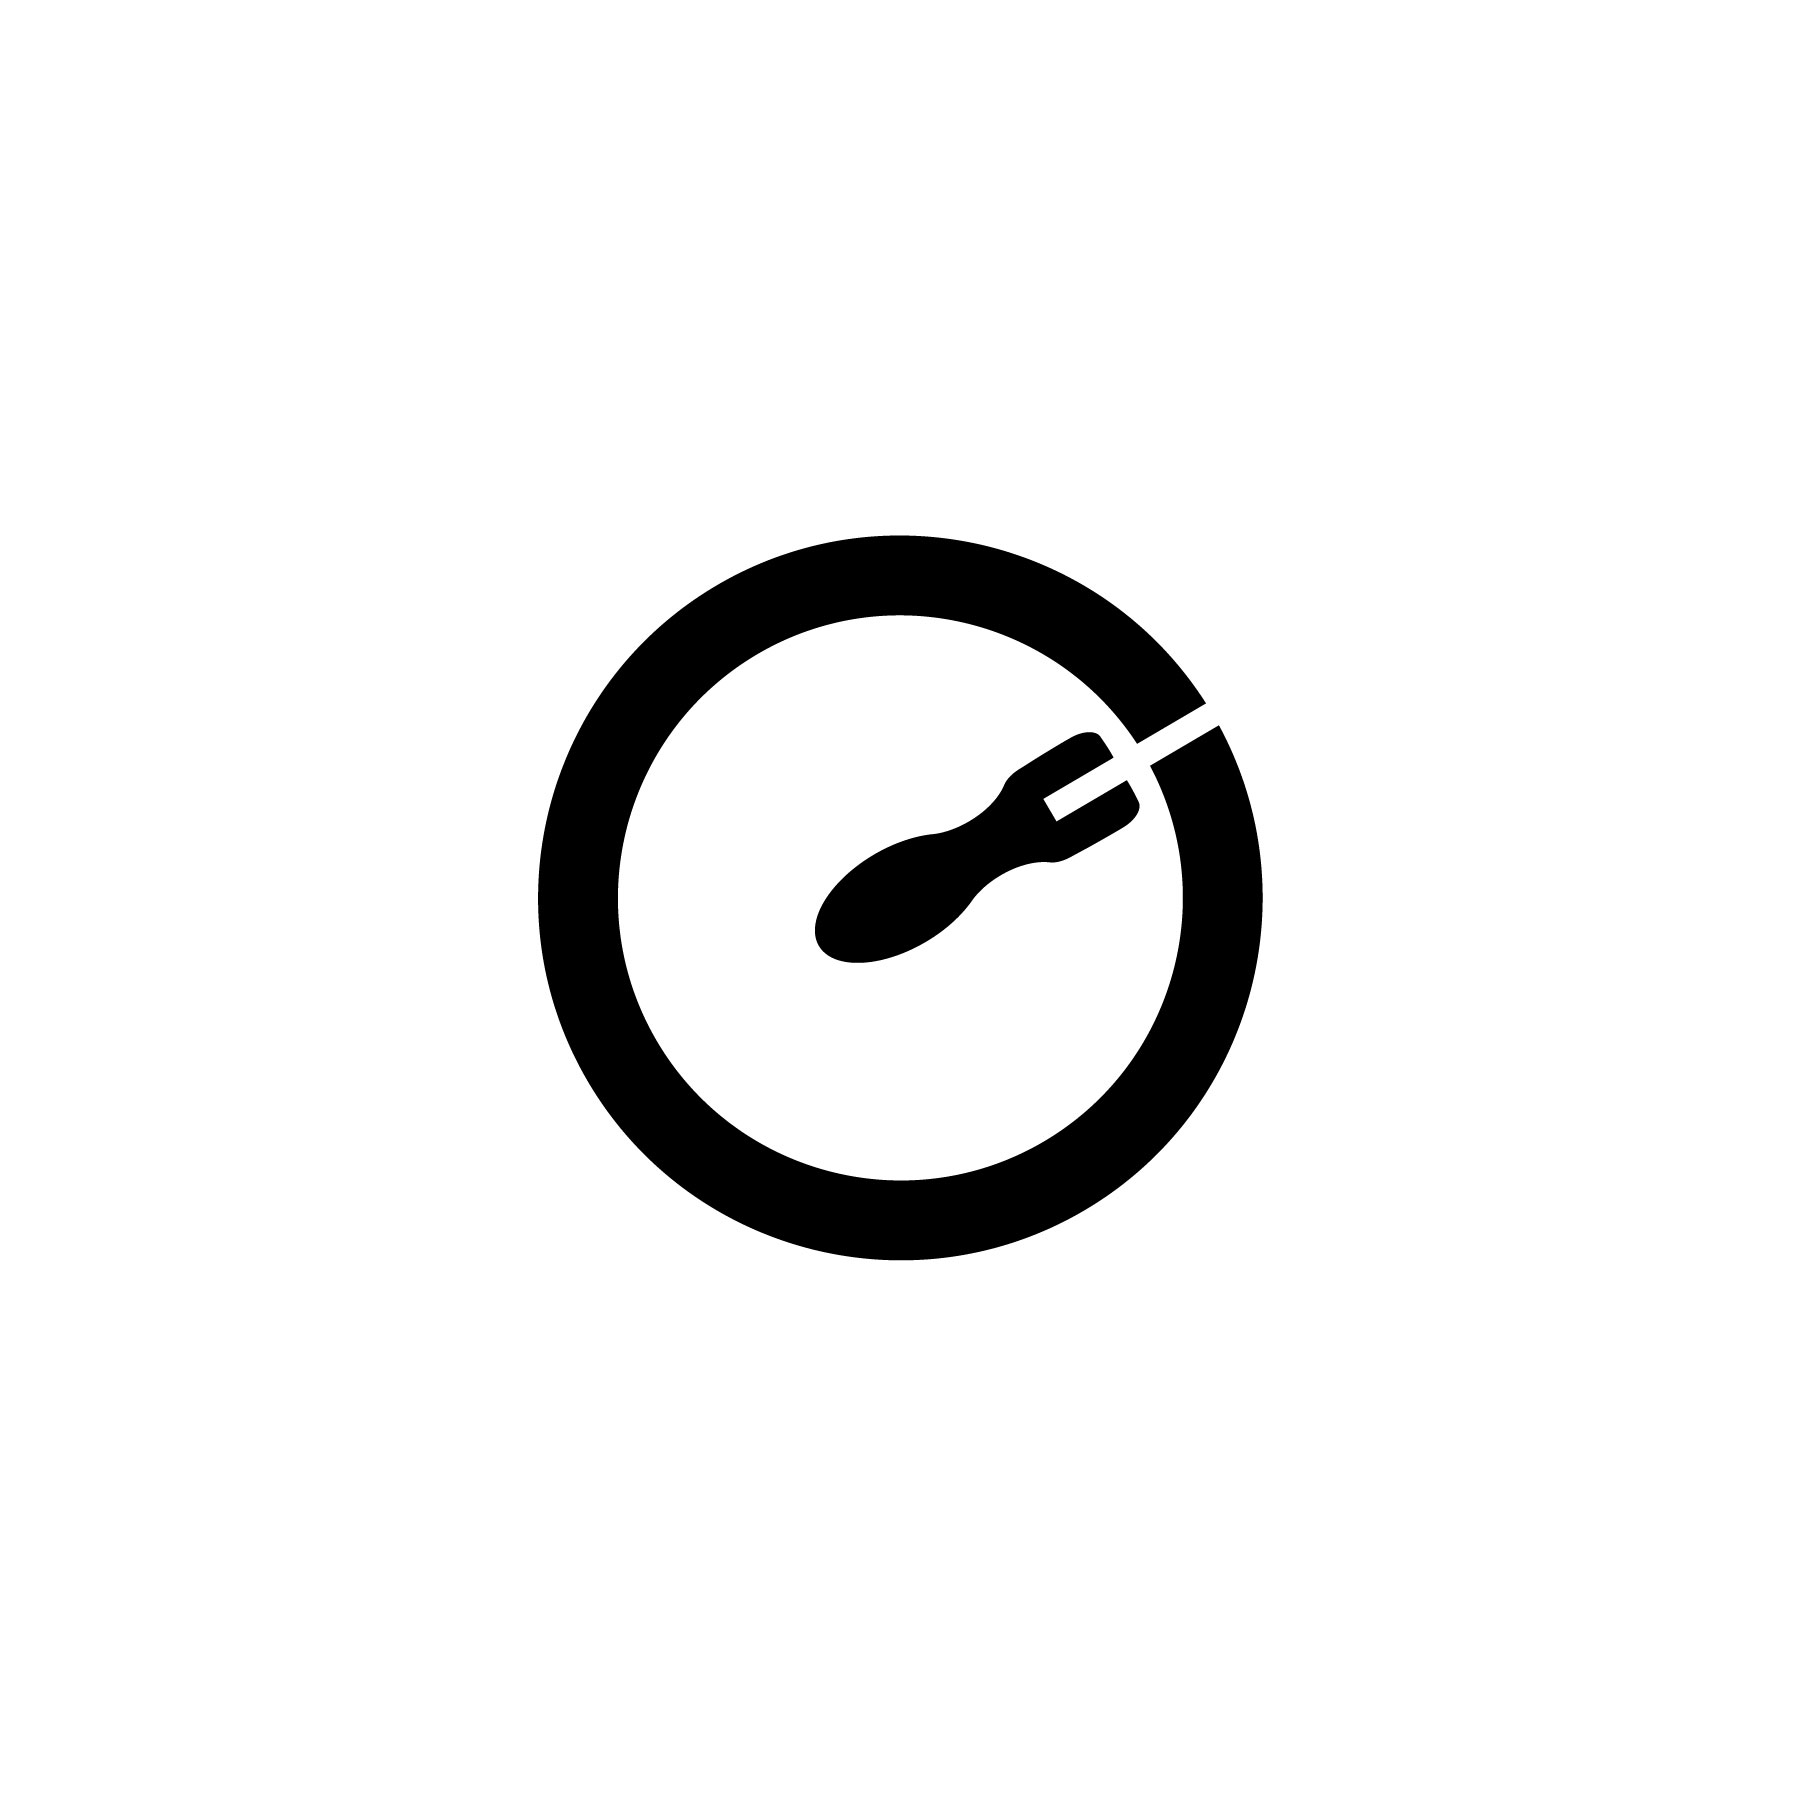 logo_clockwise.jpg